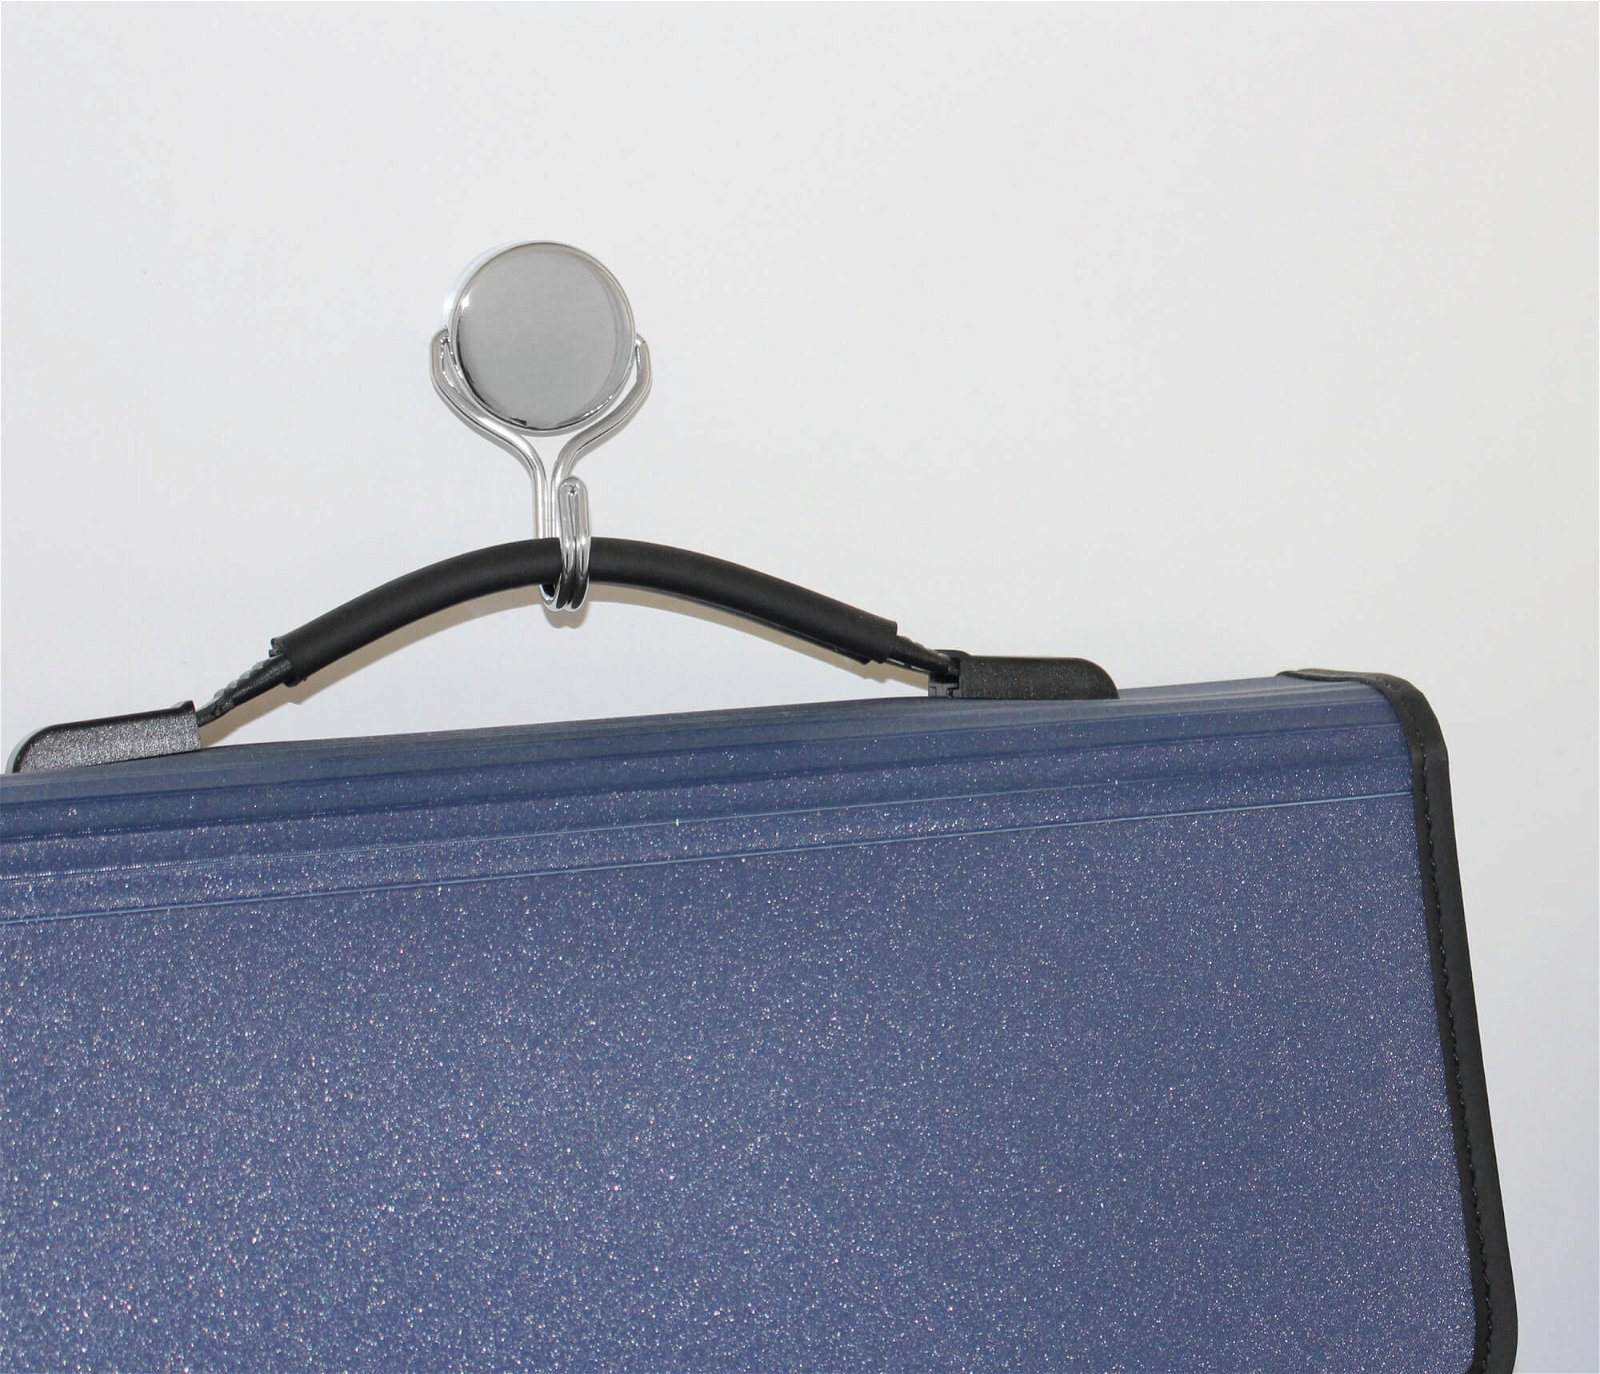 Neodym-Magnet Karusell-Haken Ø 38,5 mm, 30 kg Haftkraft, hellsilber